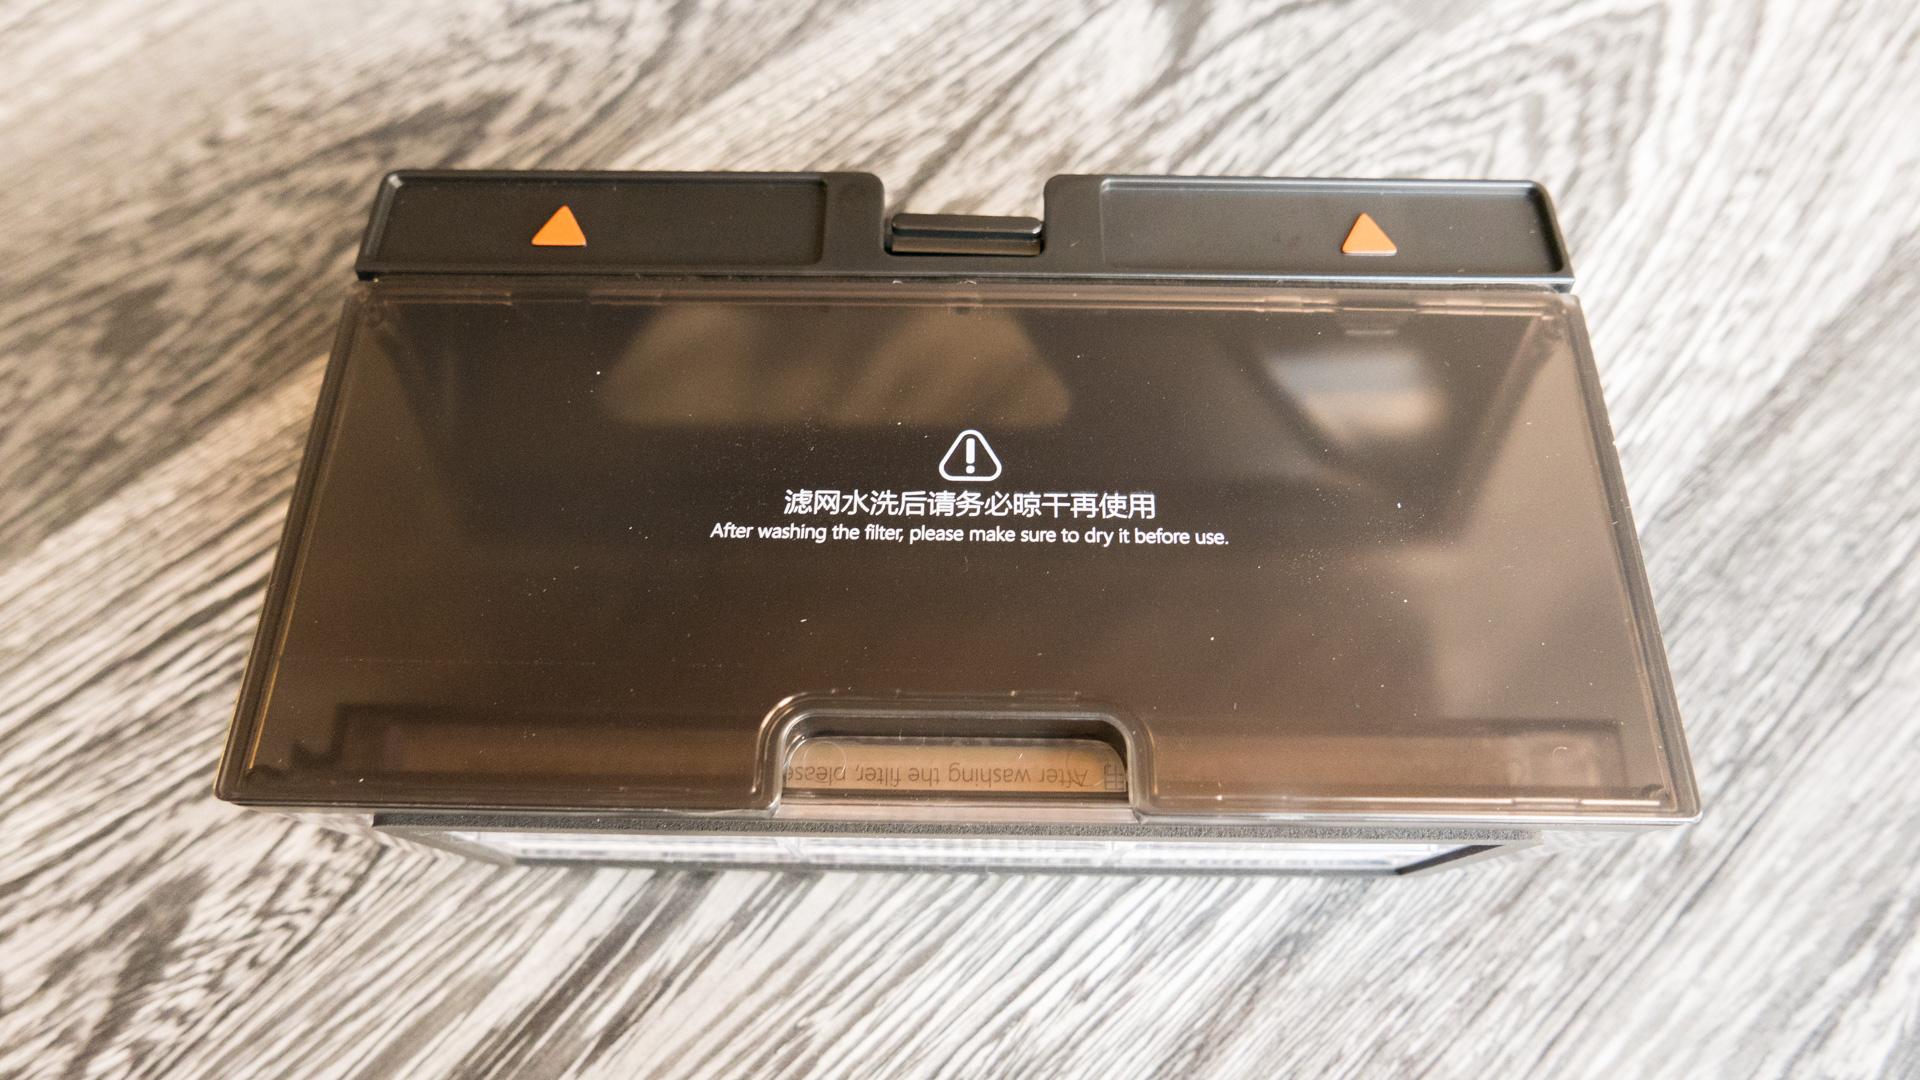 Xiaomi-roborock-S55-Staubbehälter-2